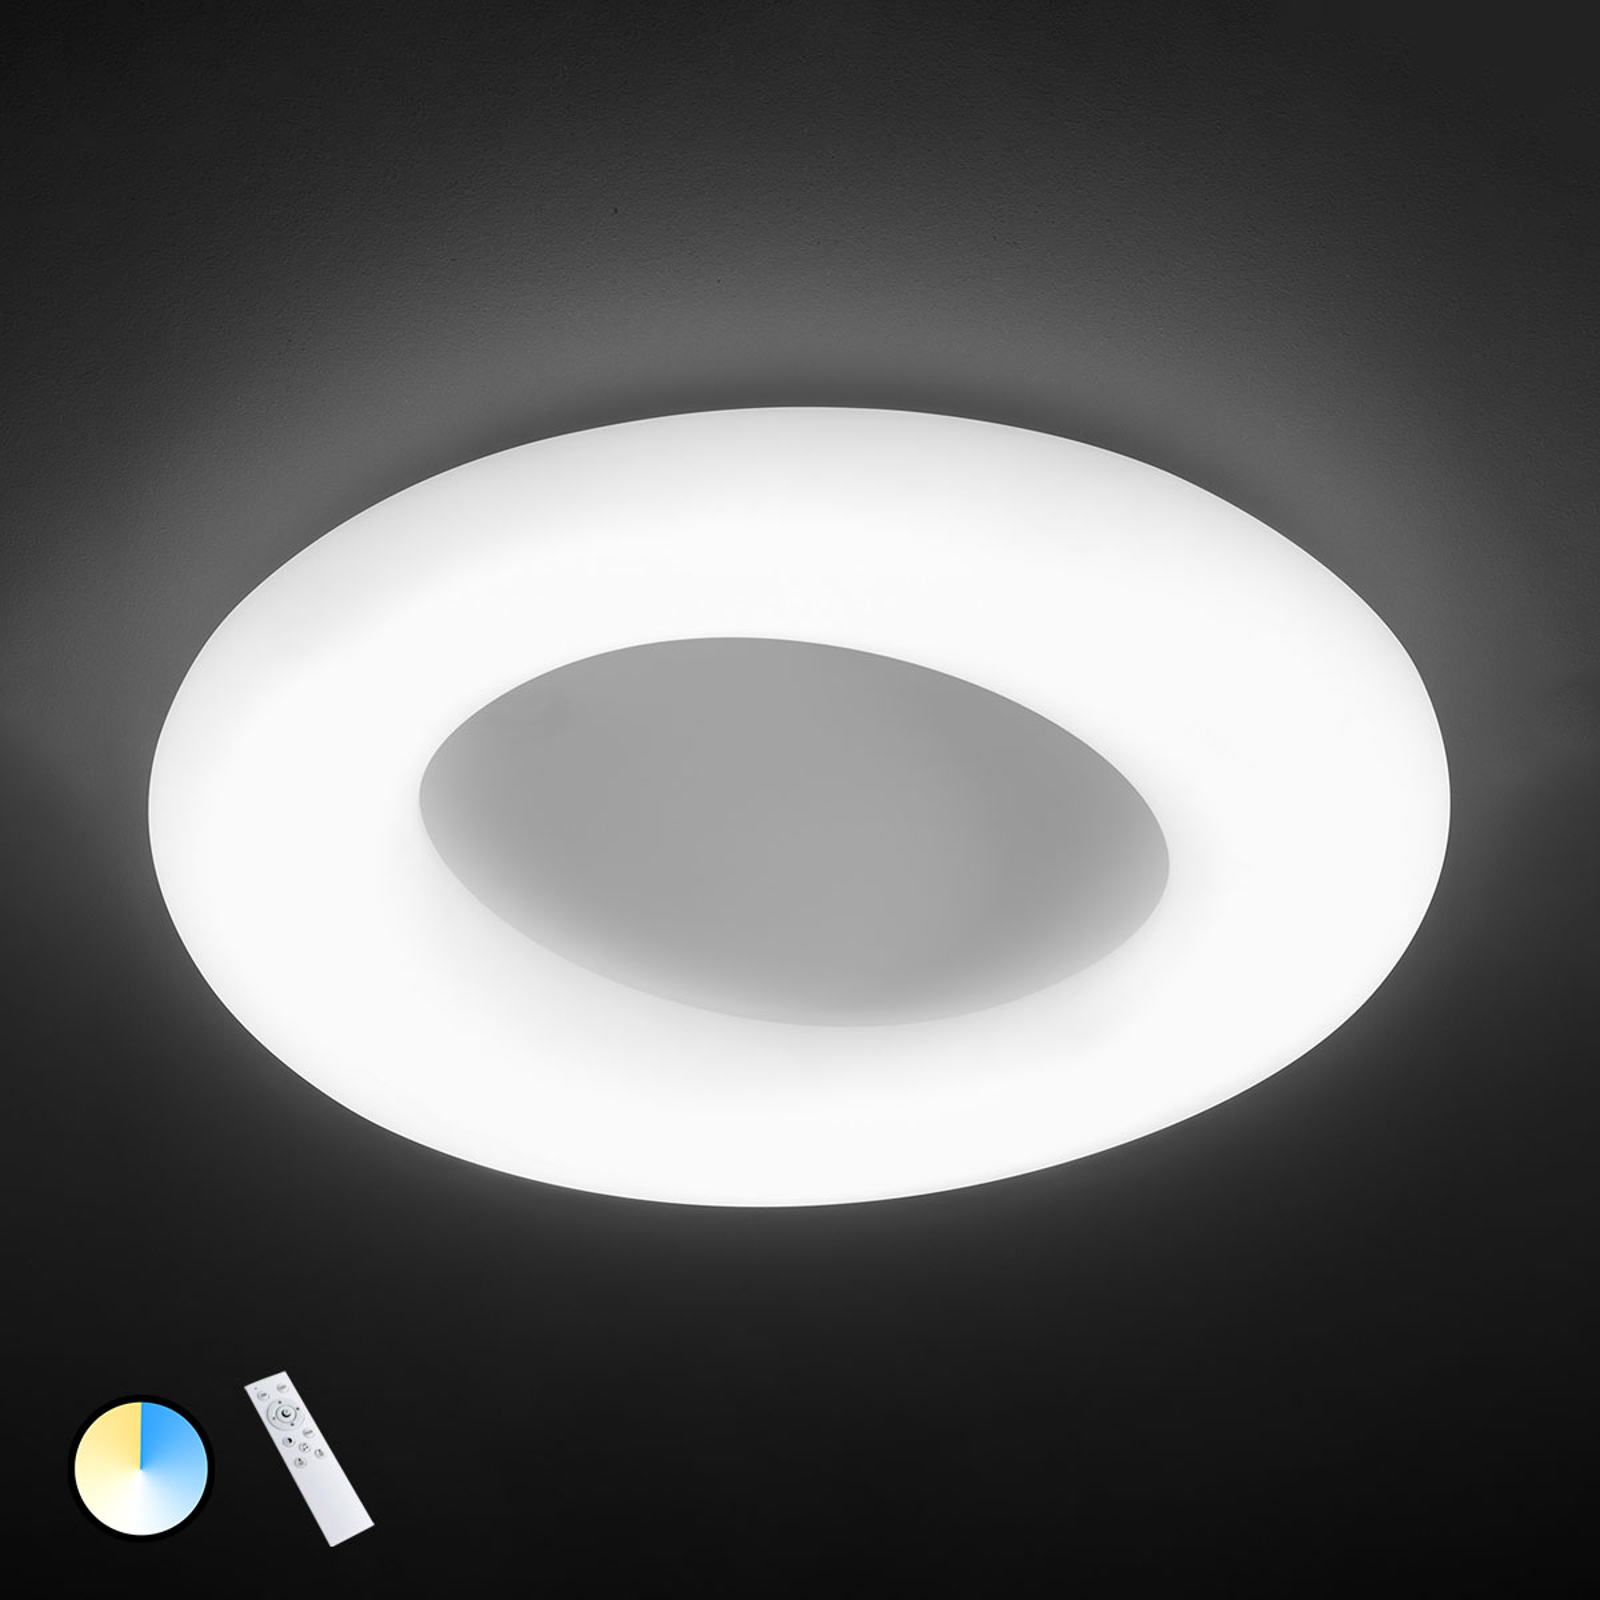 Justerbar LED-taklampa County, Ø 75 cm